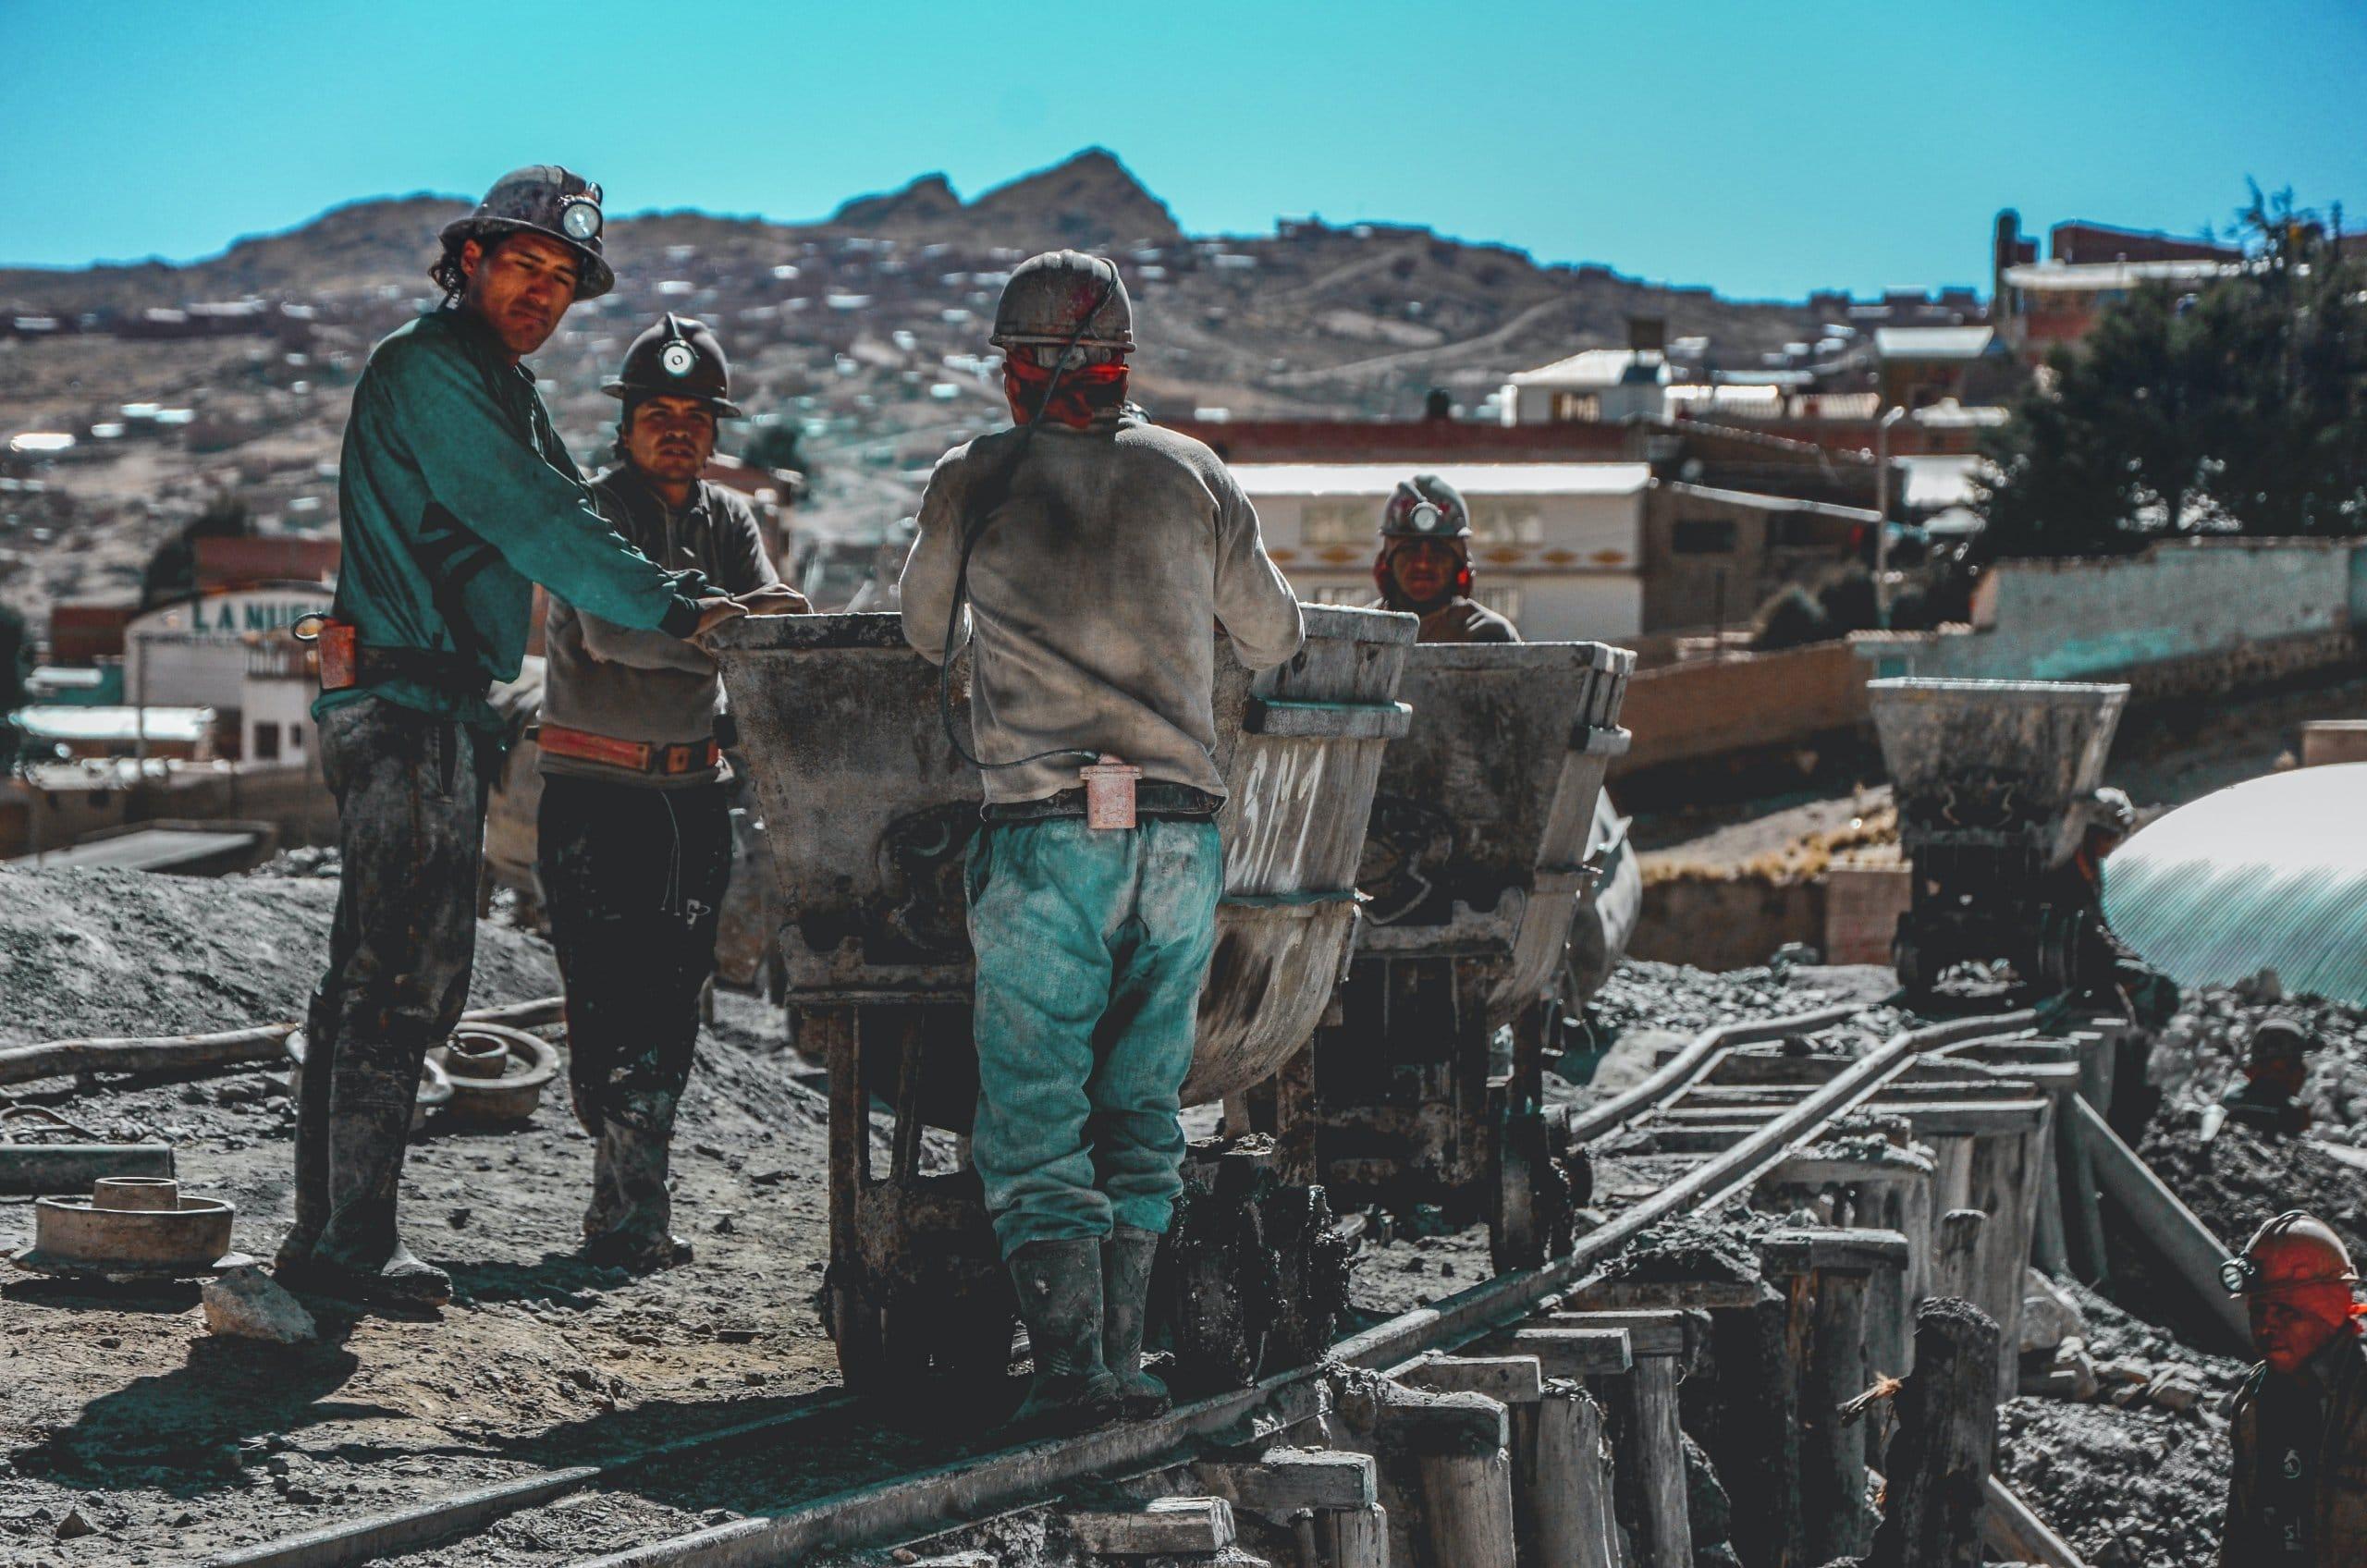 construction workers standing near wheelbarrows near mountain